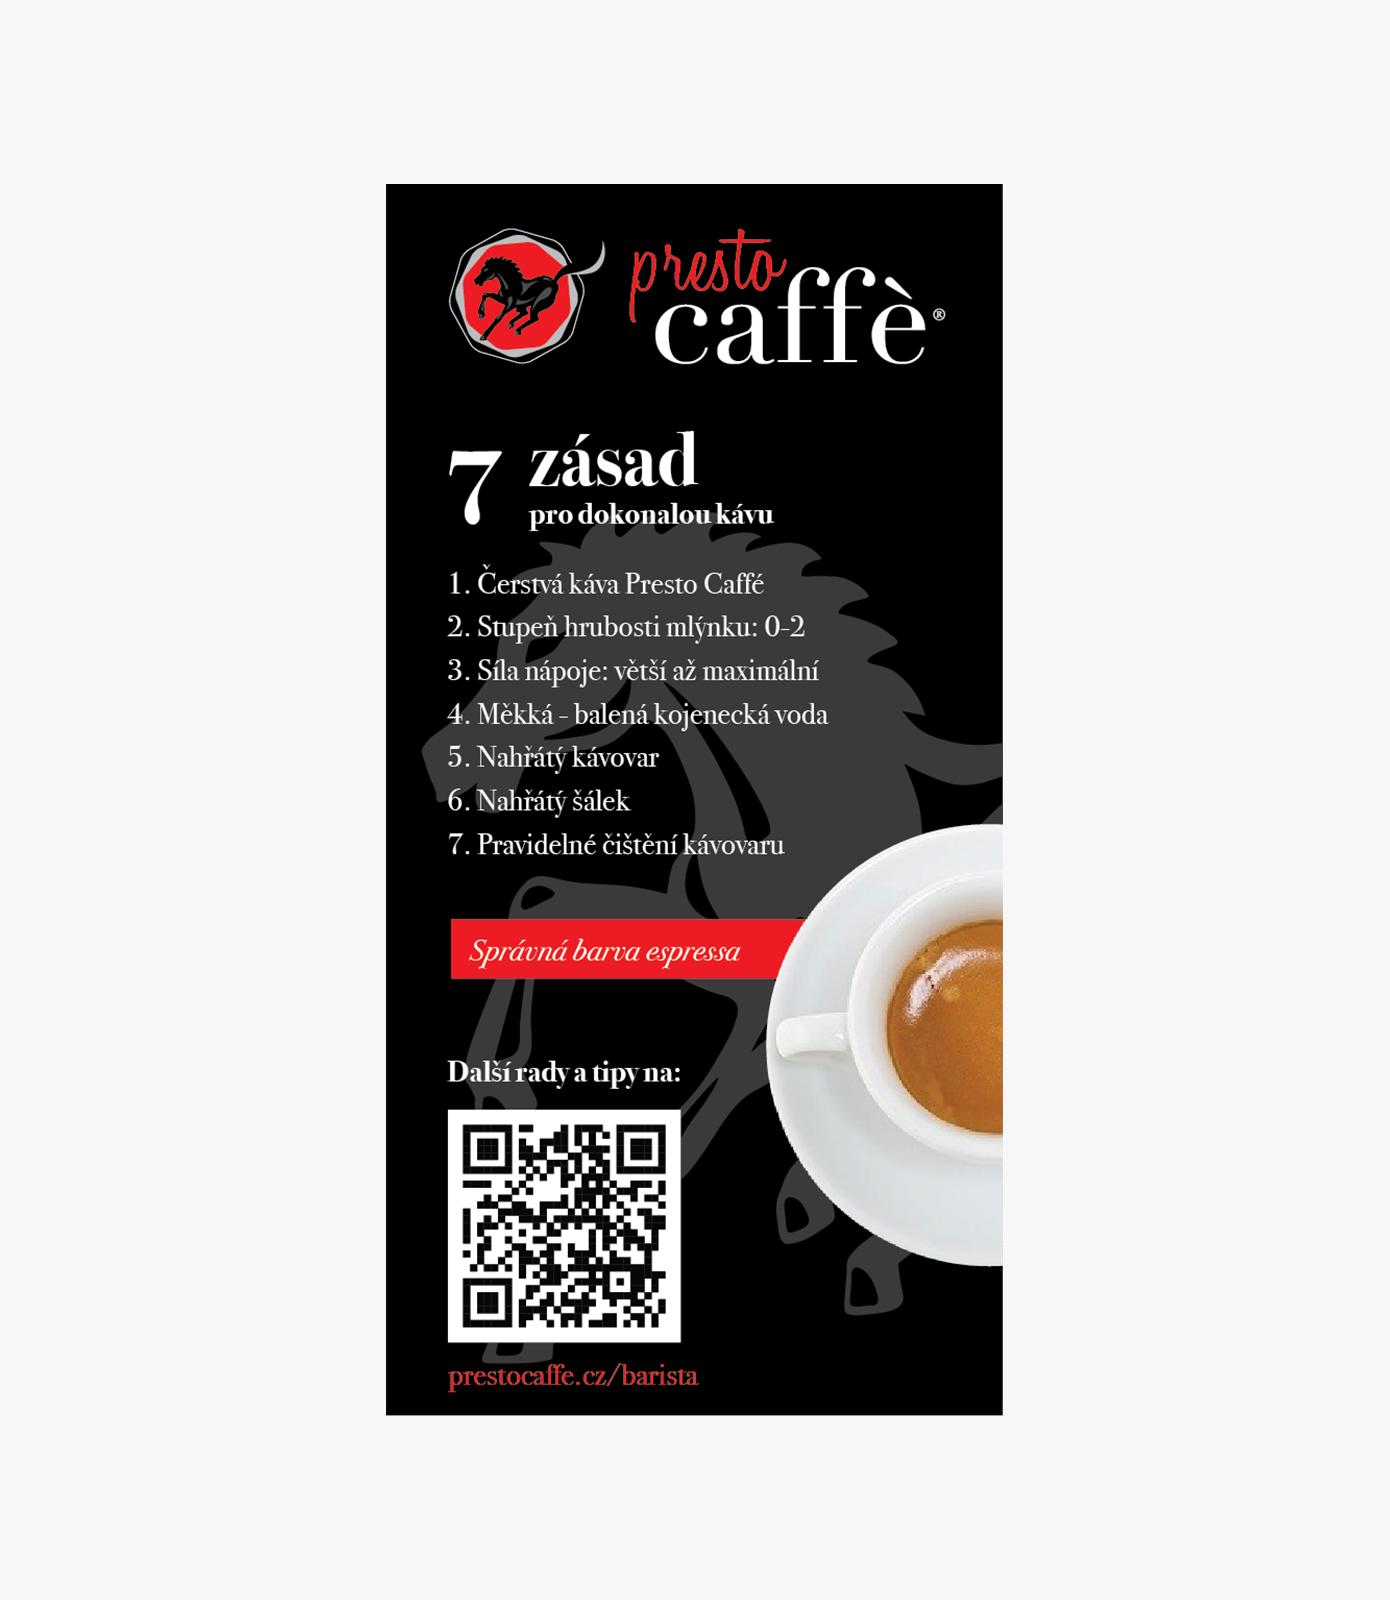 Presto Caffé - návod na přípravu kávy - nálepka